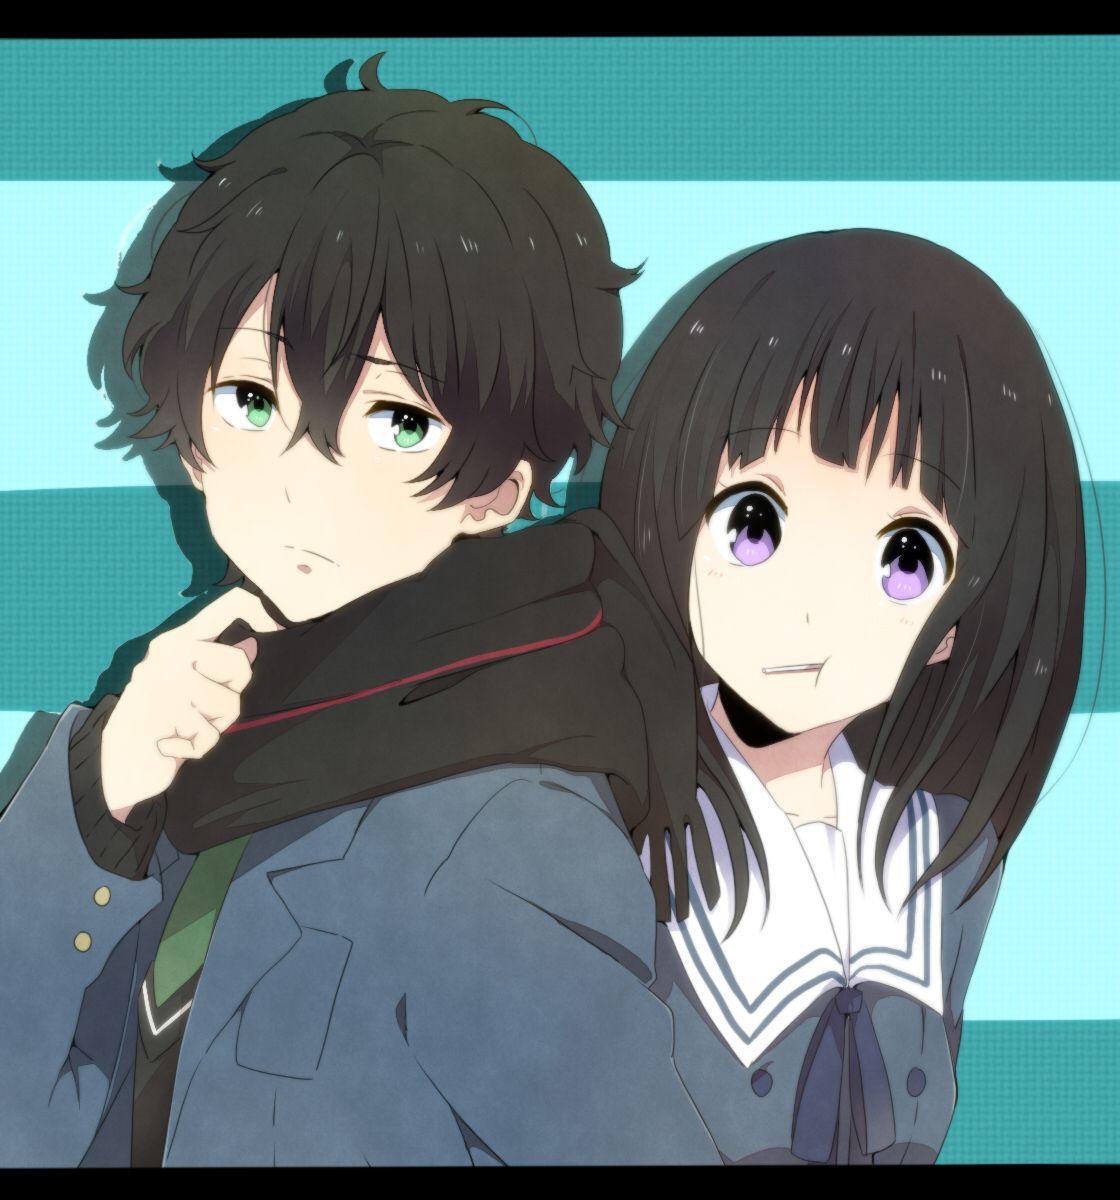 Hyouka, Oreki Houtarou, Chitanda Eru Anime, Manga anime